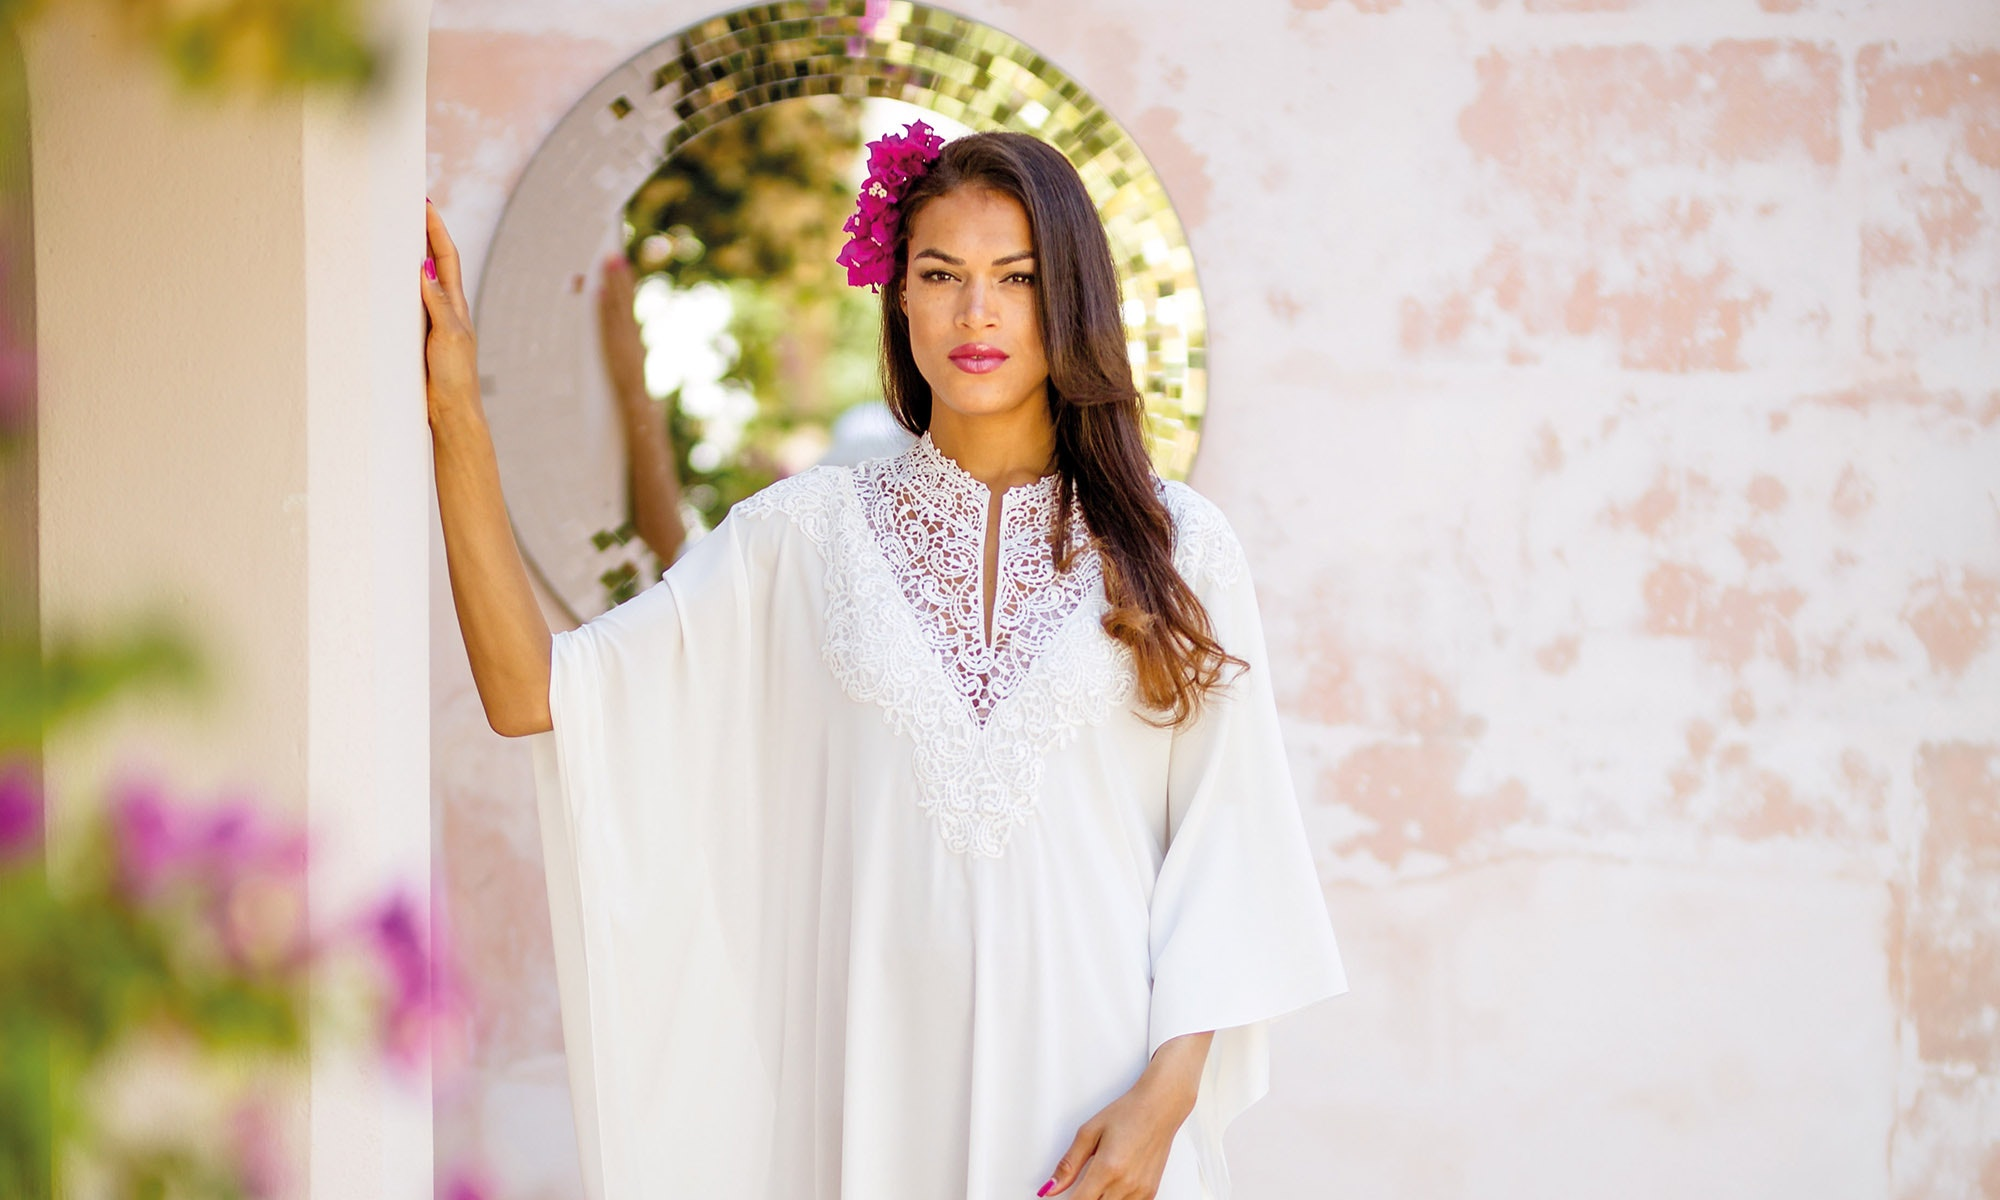 Woman wearing white dress photo